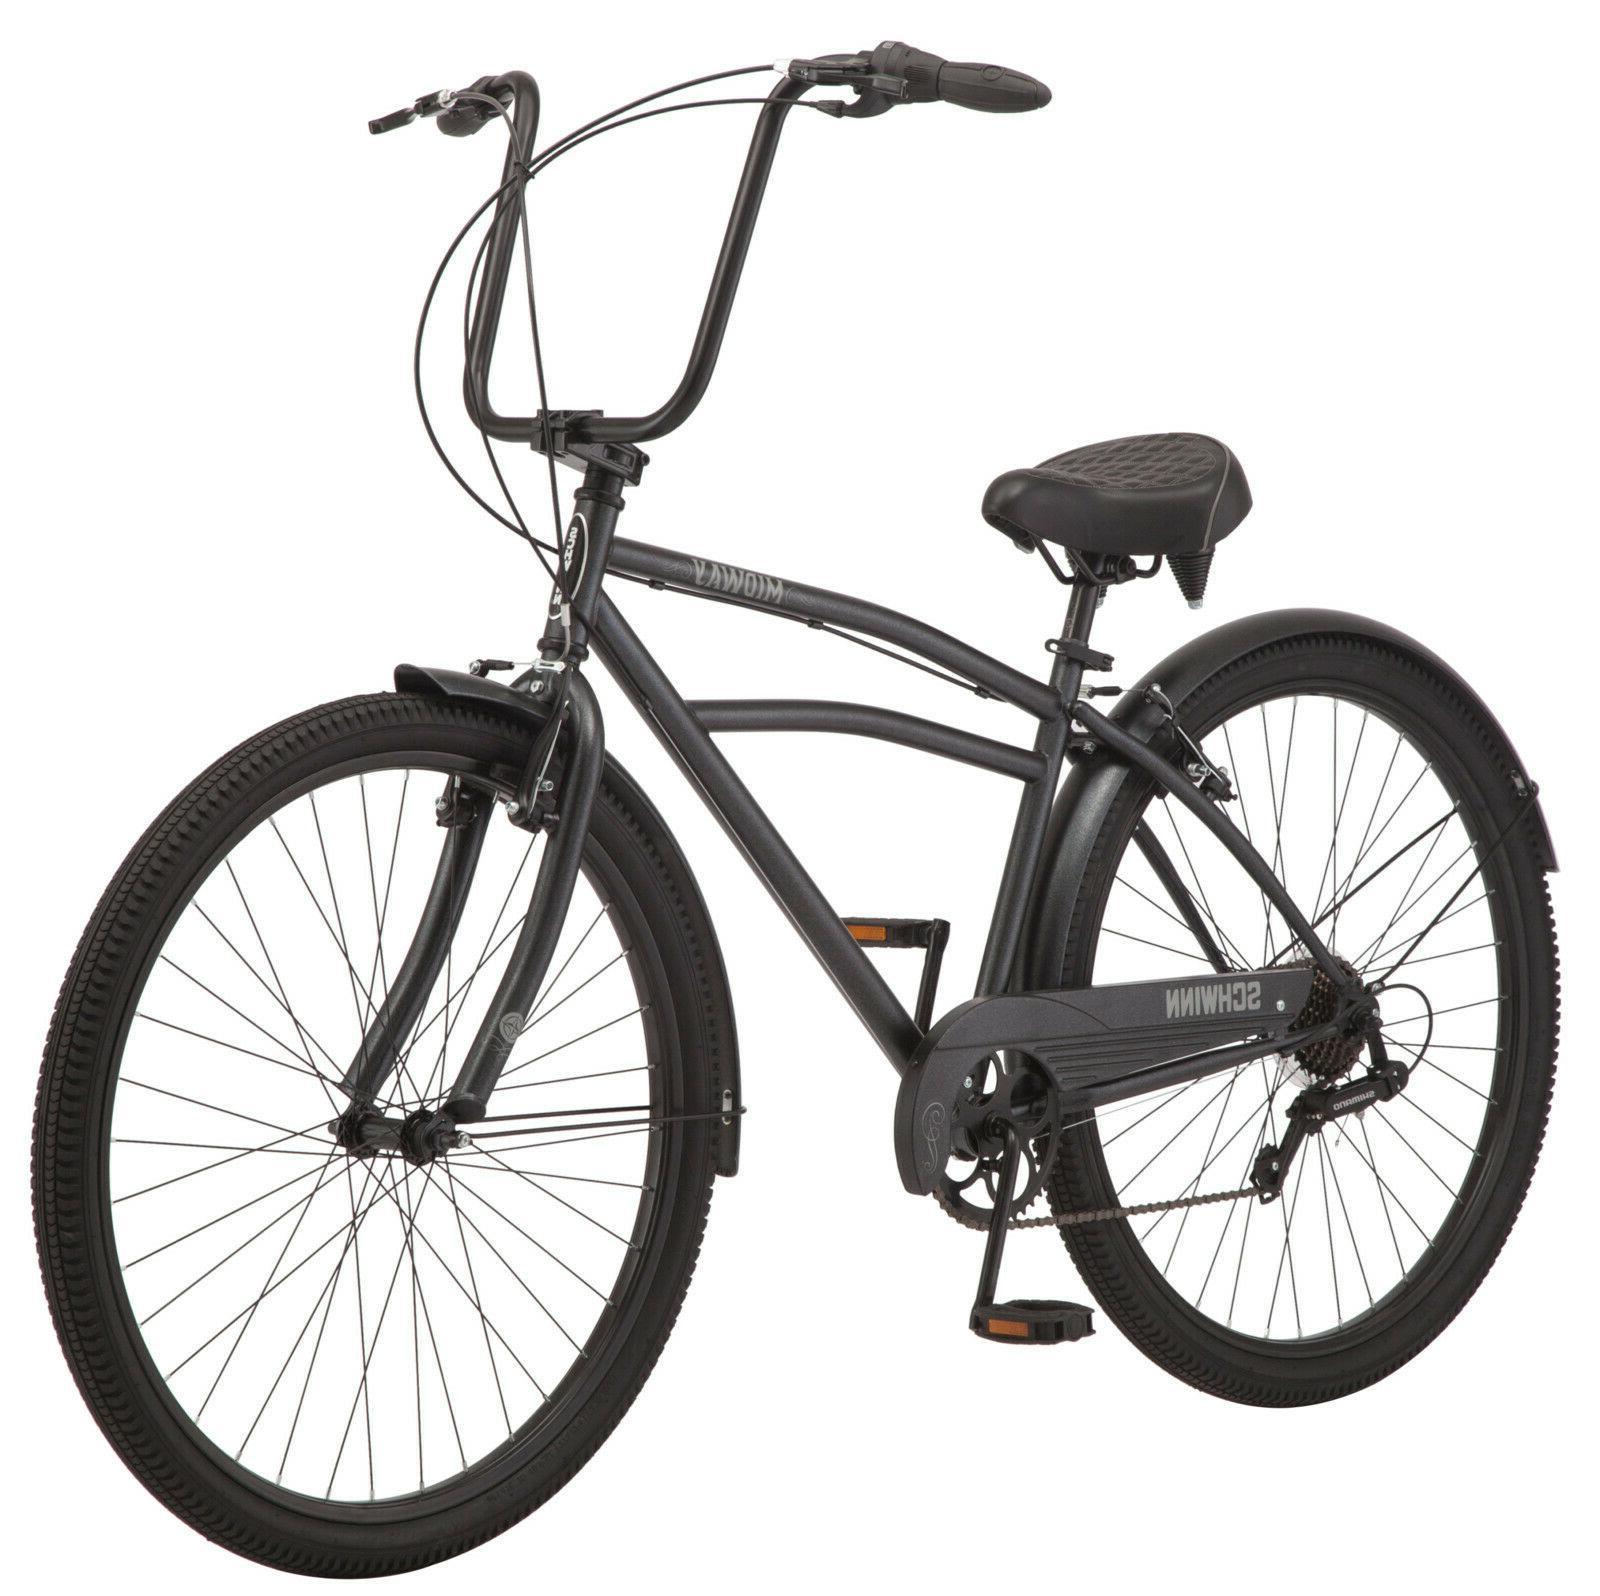 cruiser bike 7 speed twist shifter shimano